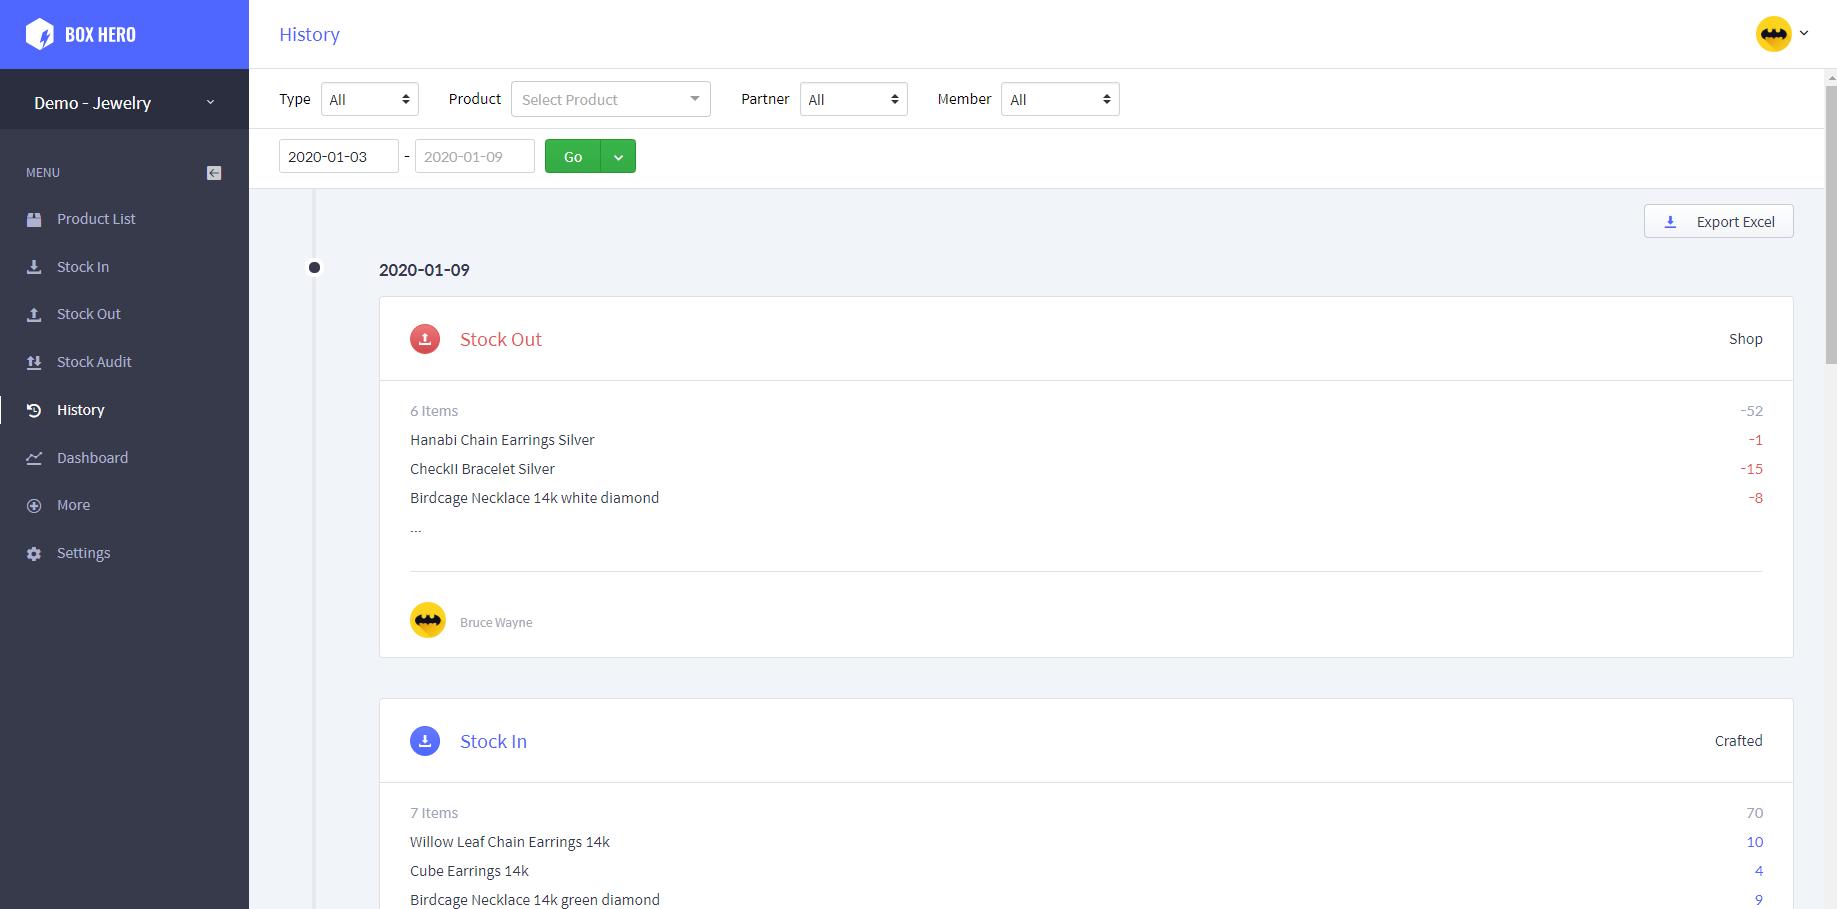 BoxHero inventory history screenshot